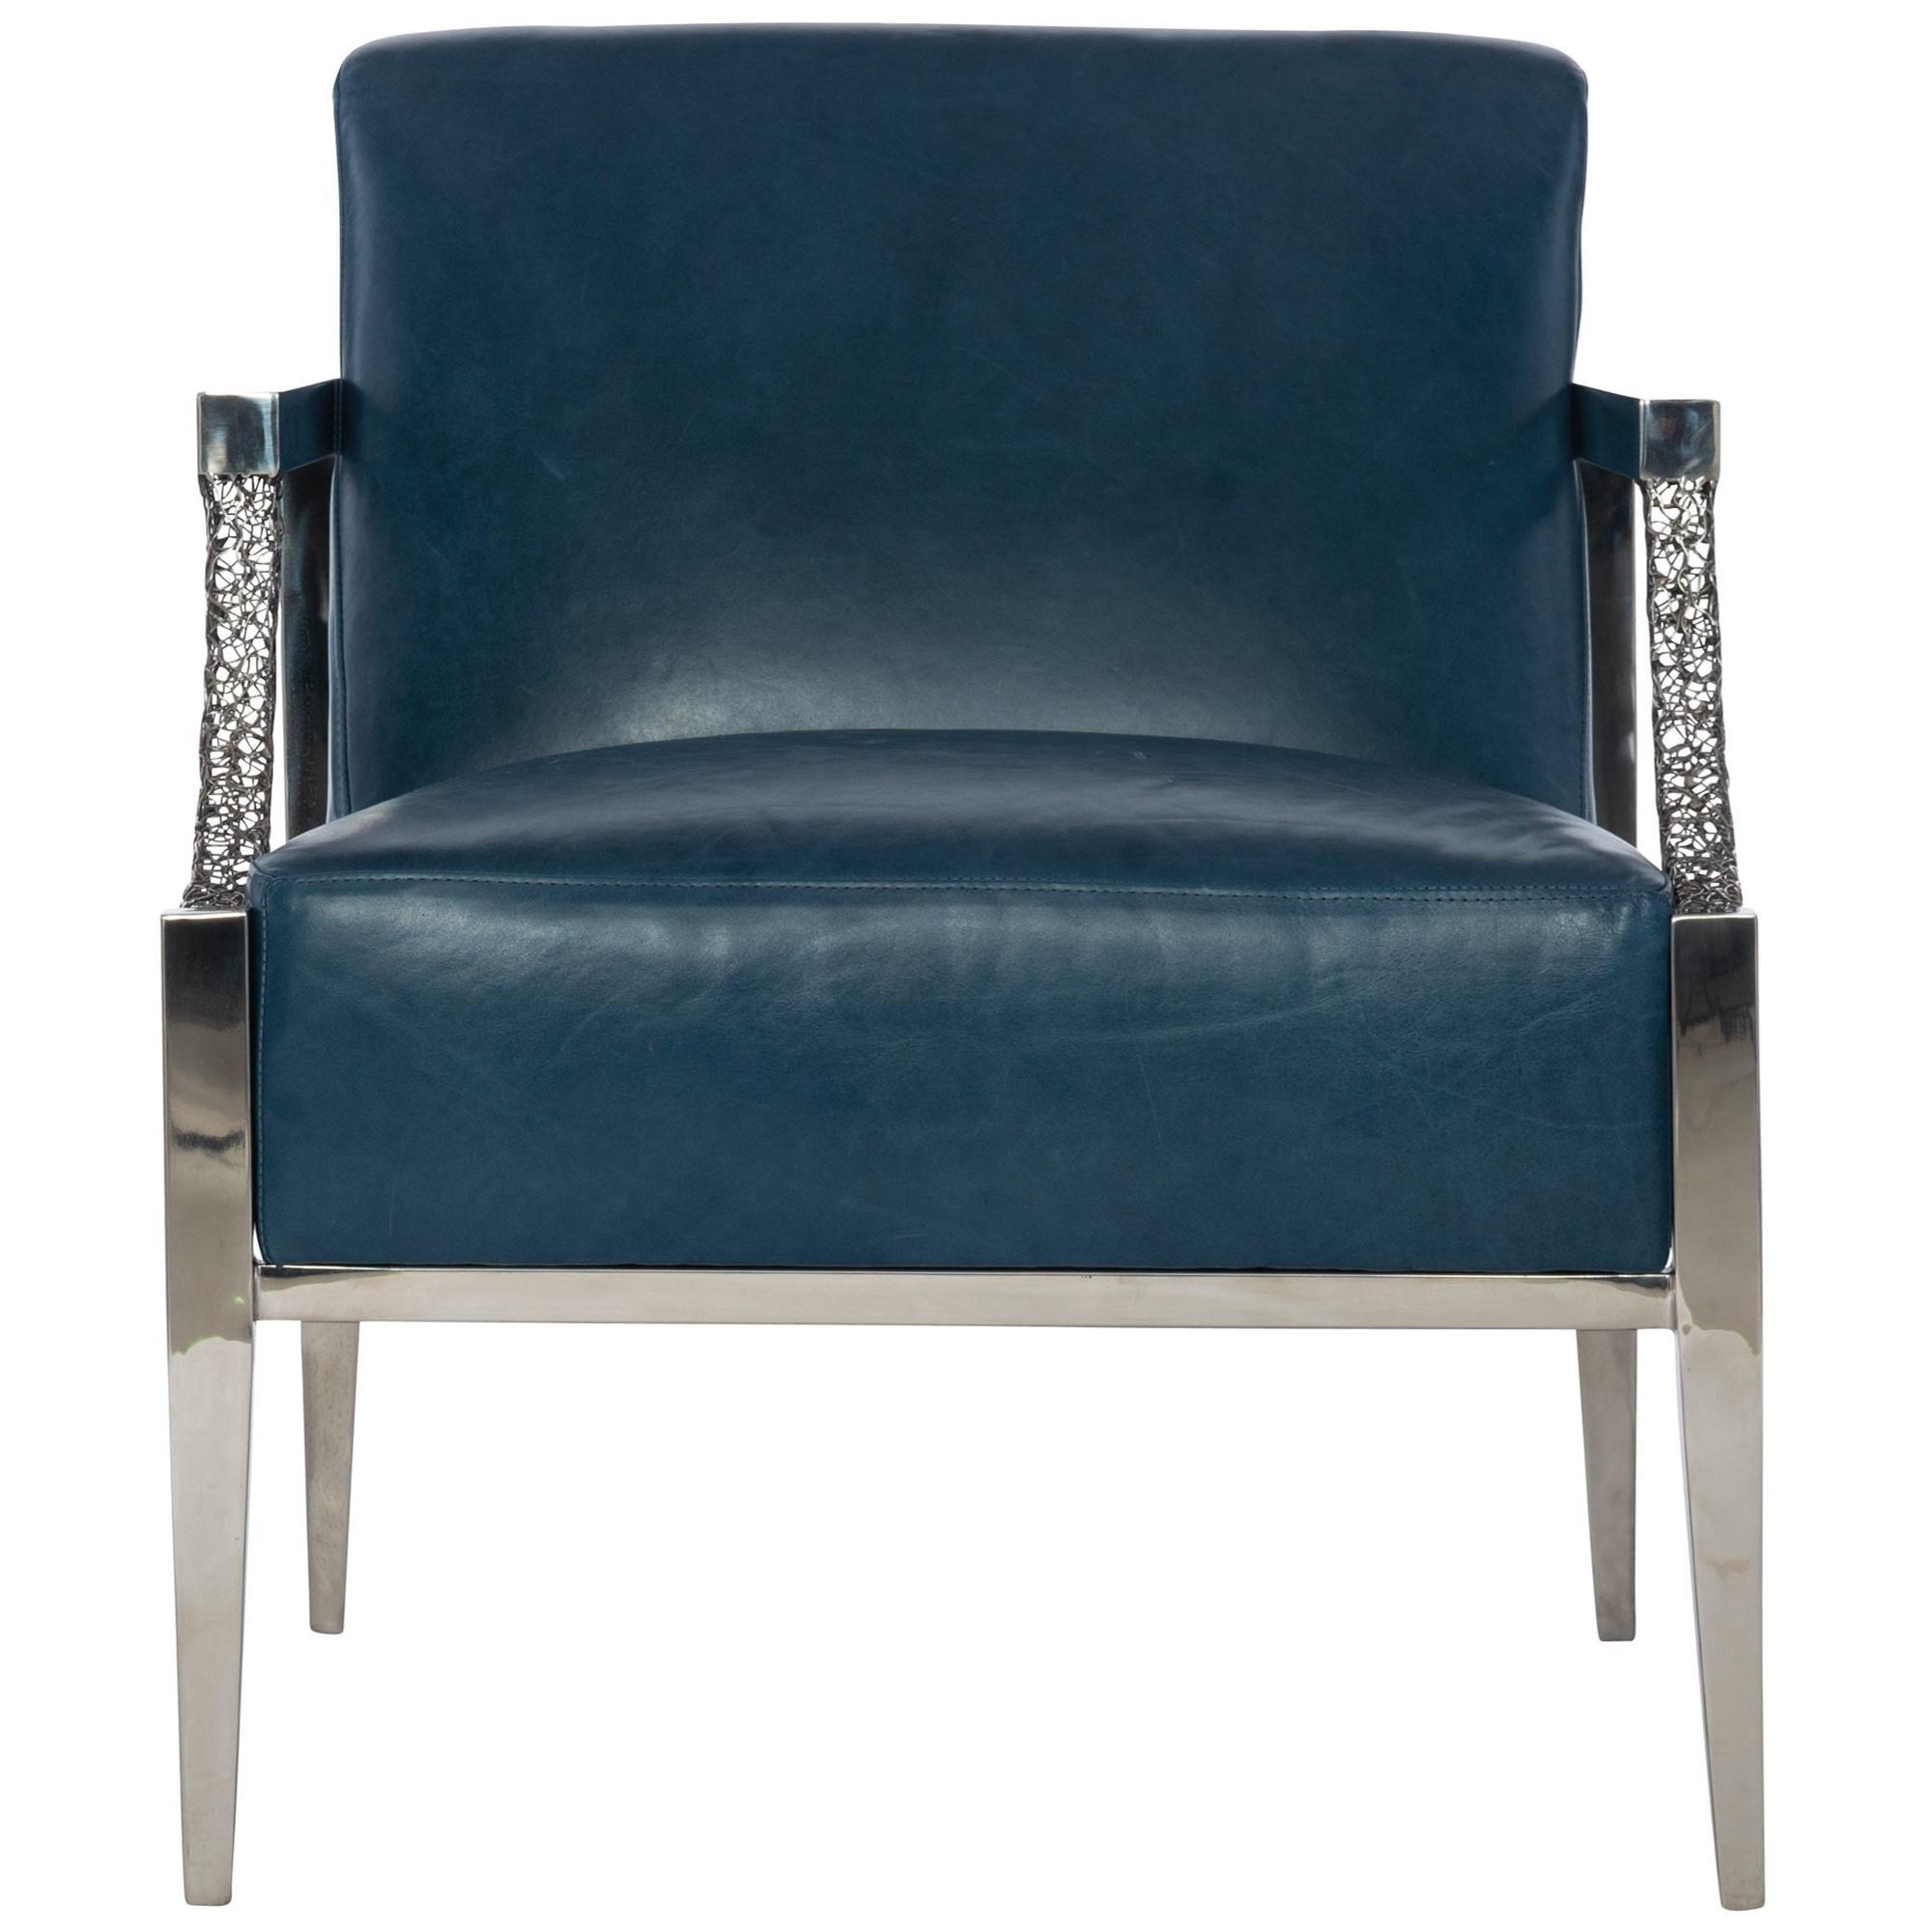 Interiors - Julien Chair at Williams & Kay